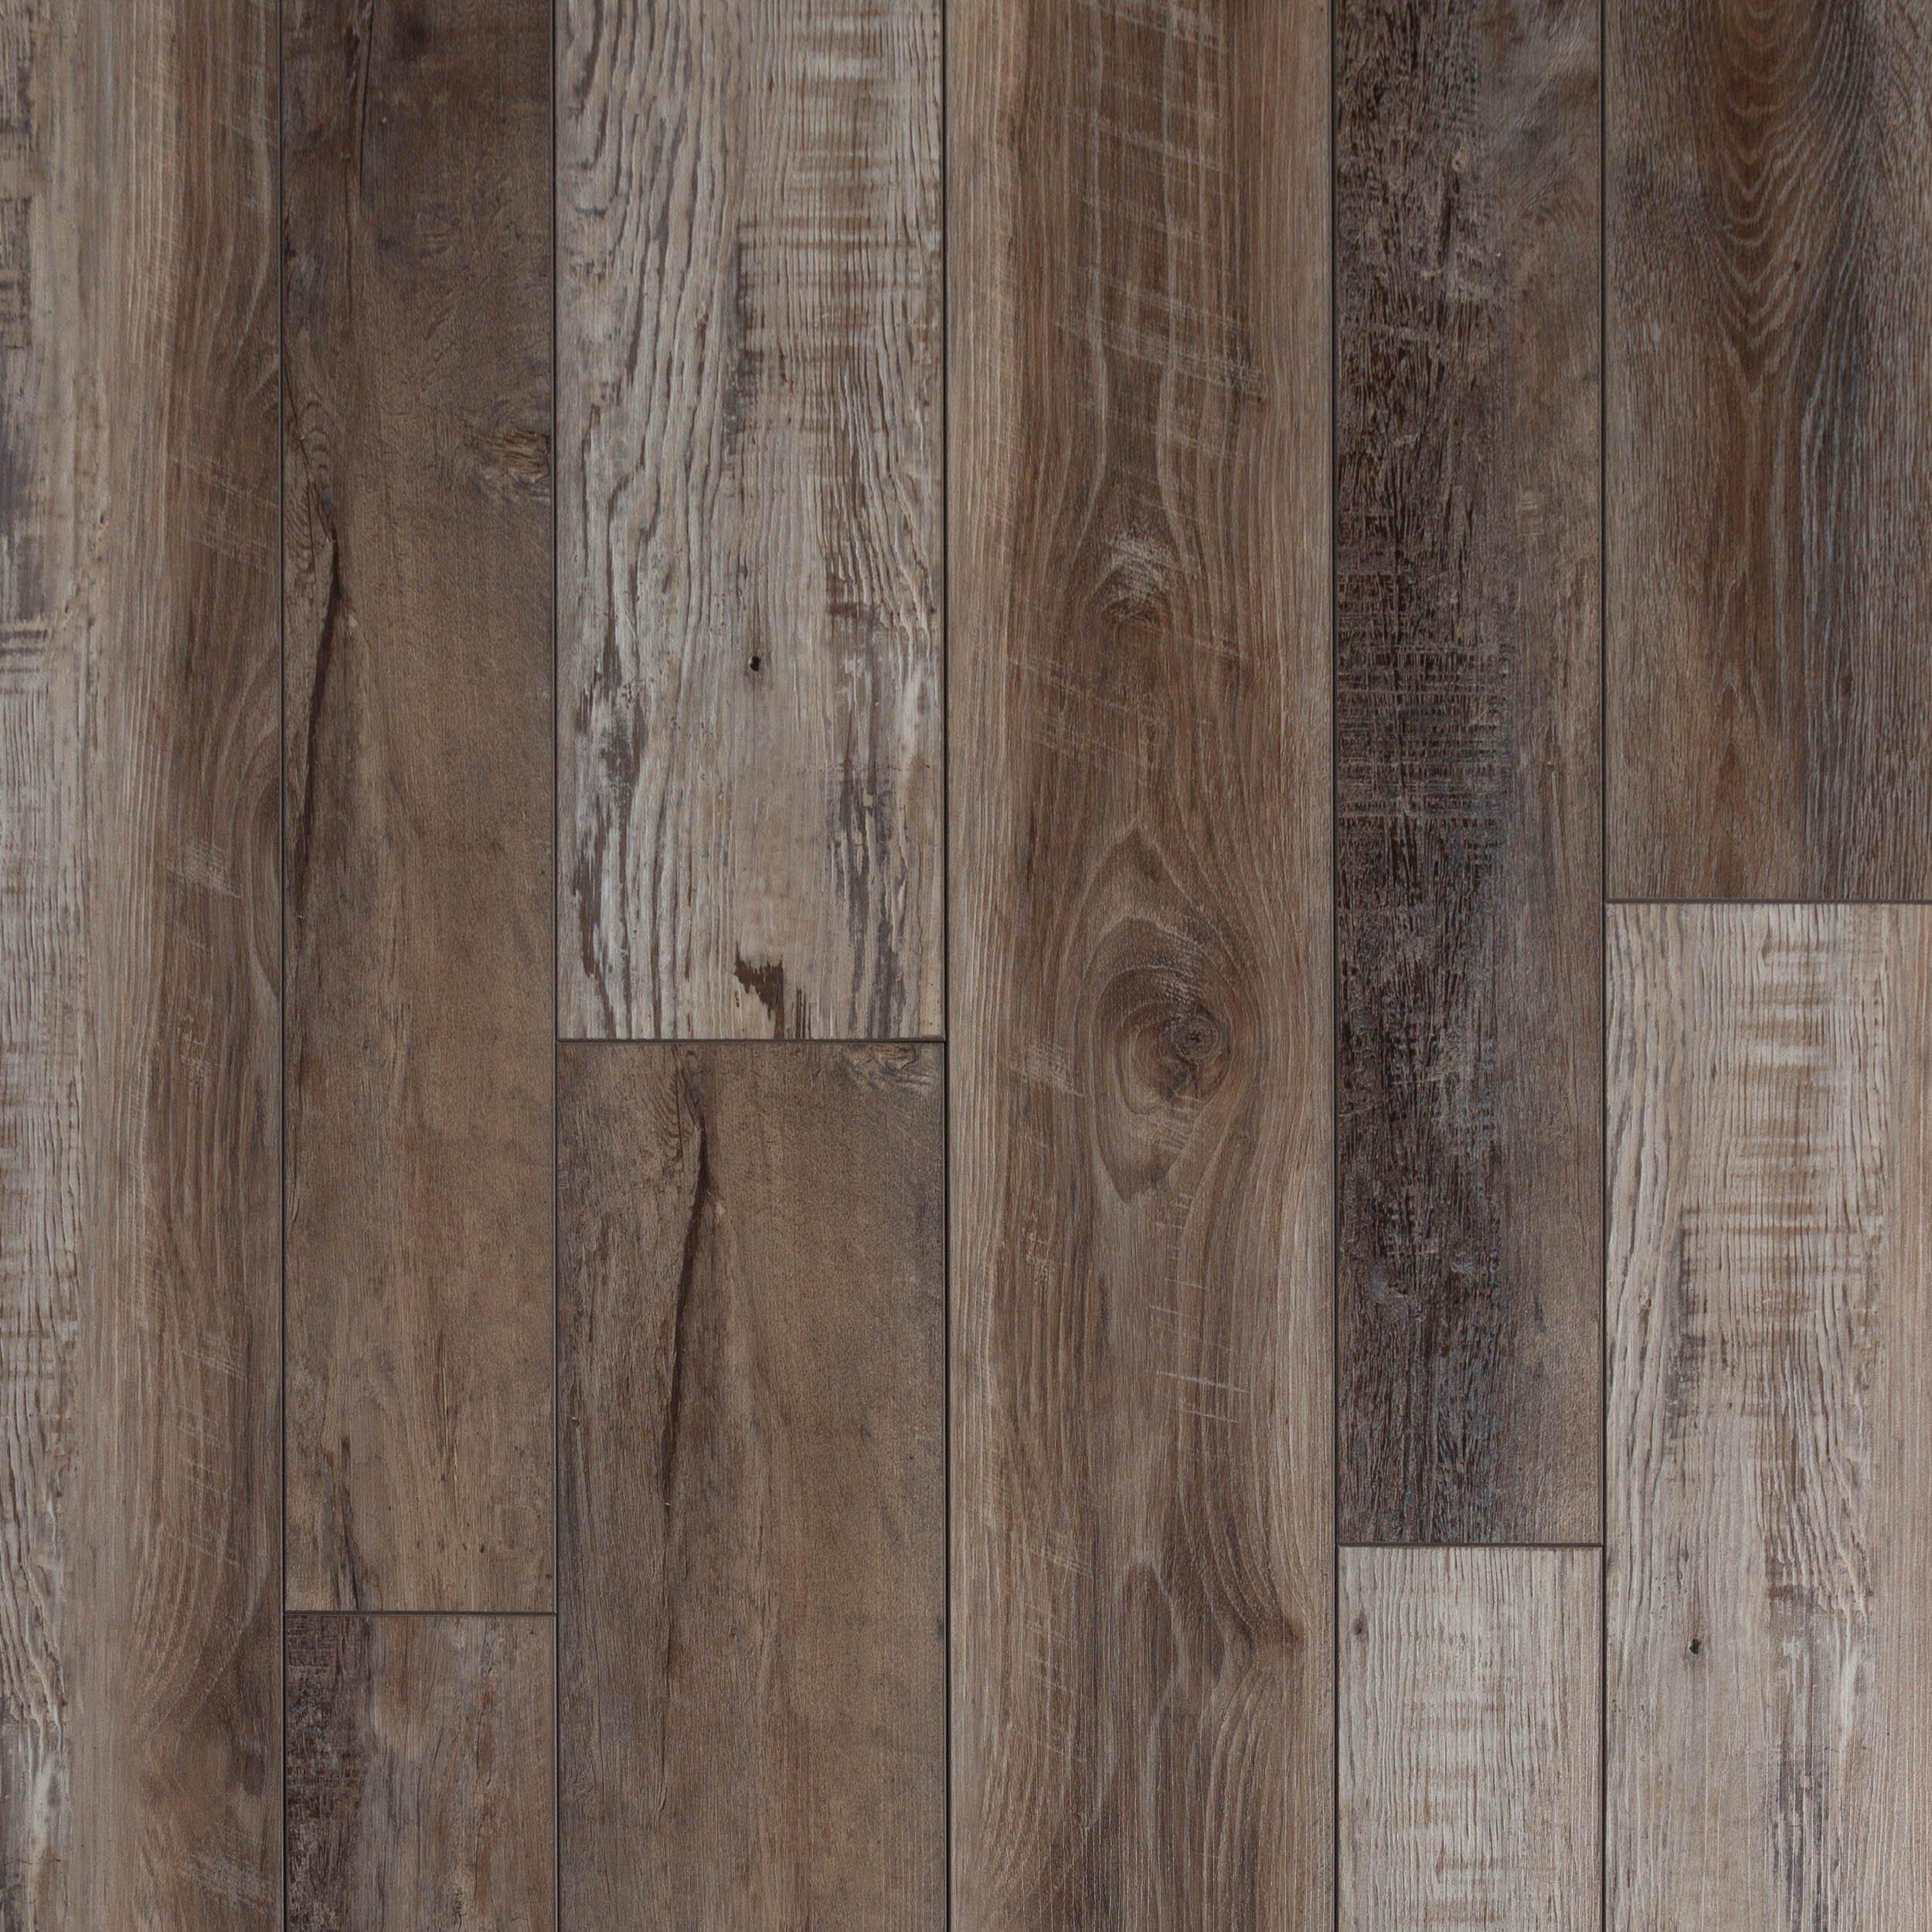 Kingsbarn Rigid Core Luxury Vinyl Plank Cork Back